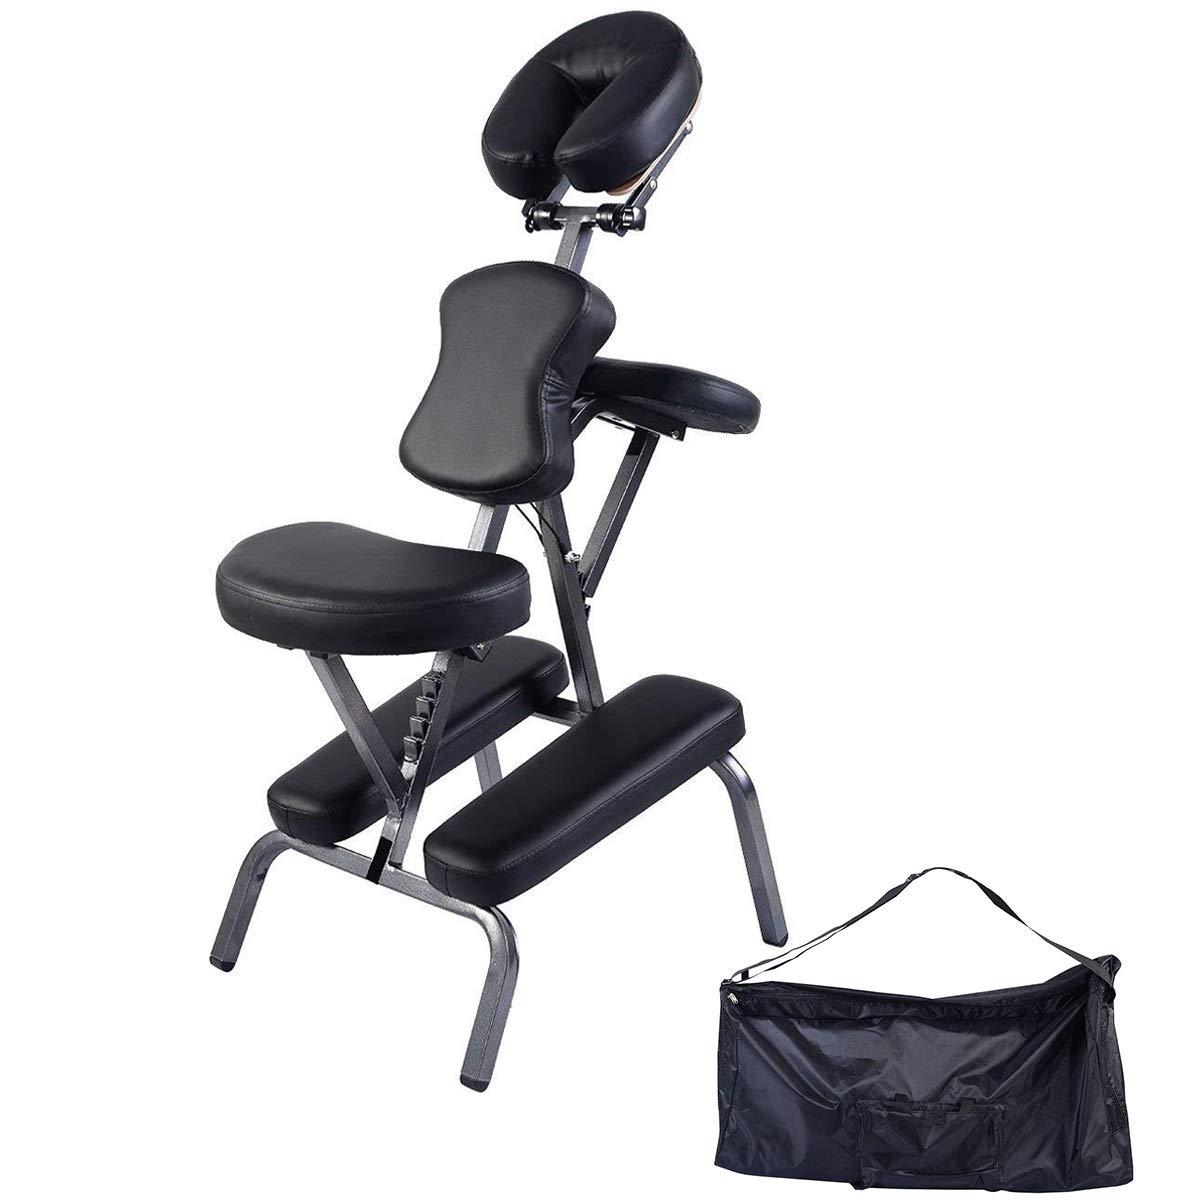 Giantex Portable Light Weight Massage Chair Travel Massage Tattoo Spa Chair w/Carrying Bag